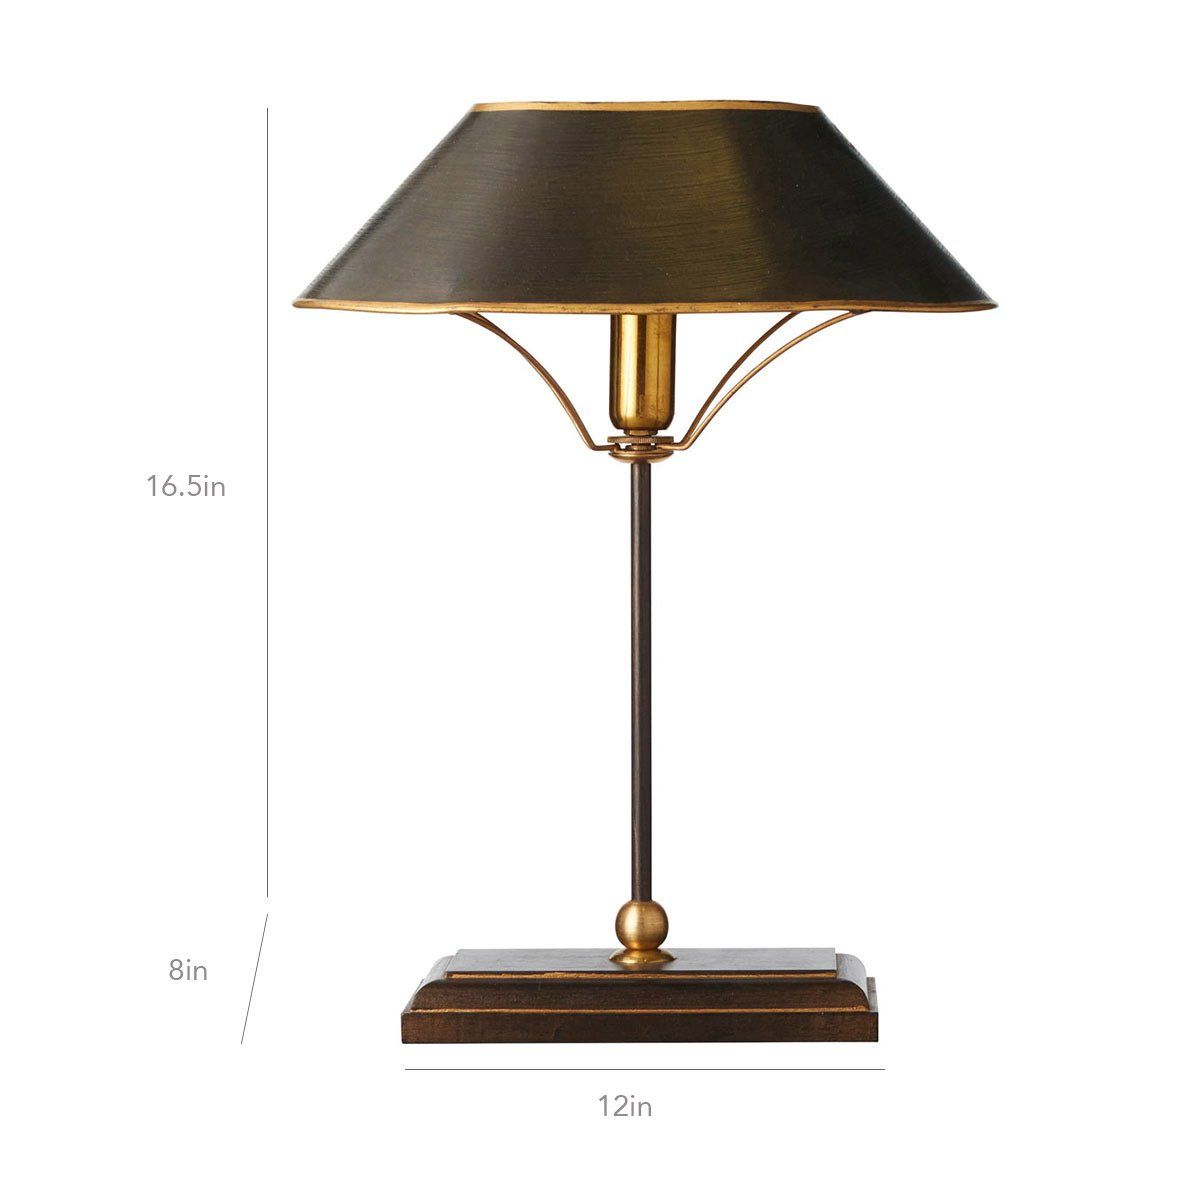 Grisewood Lamp And Shade Brown Oka Lamp Metal Table Lamps Small Metal Table